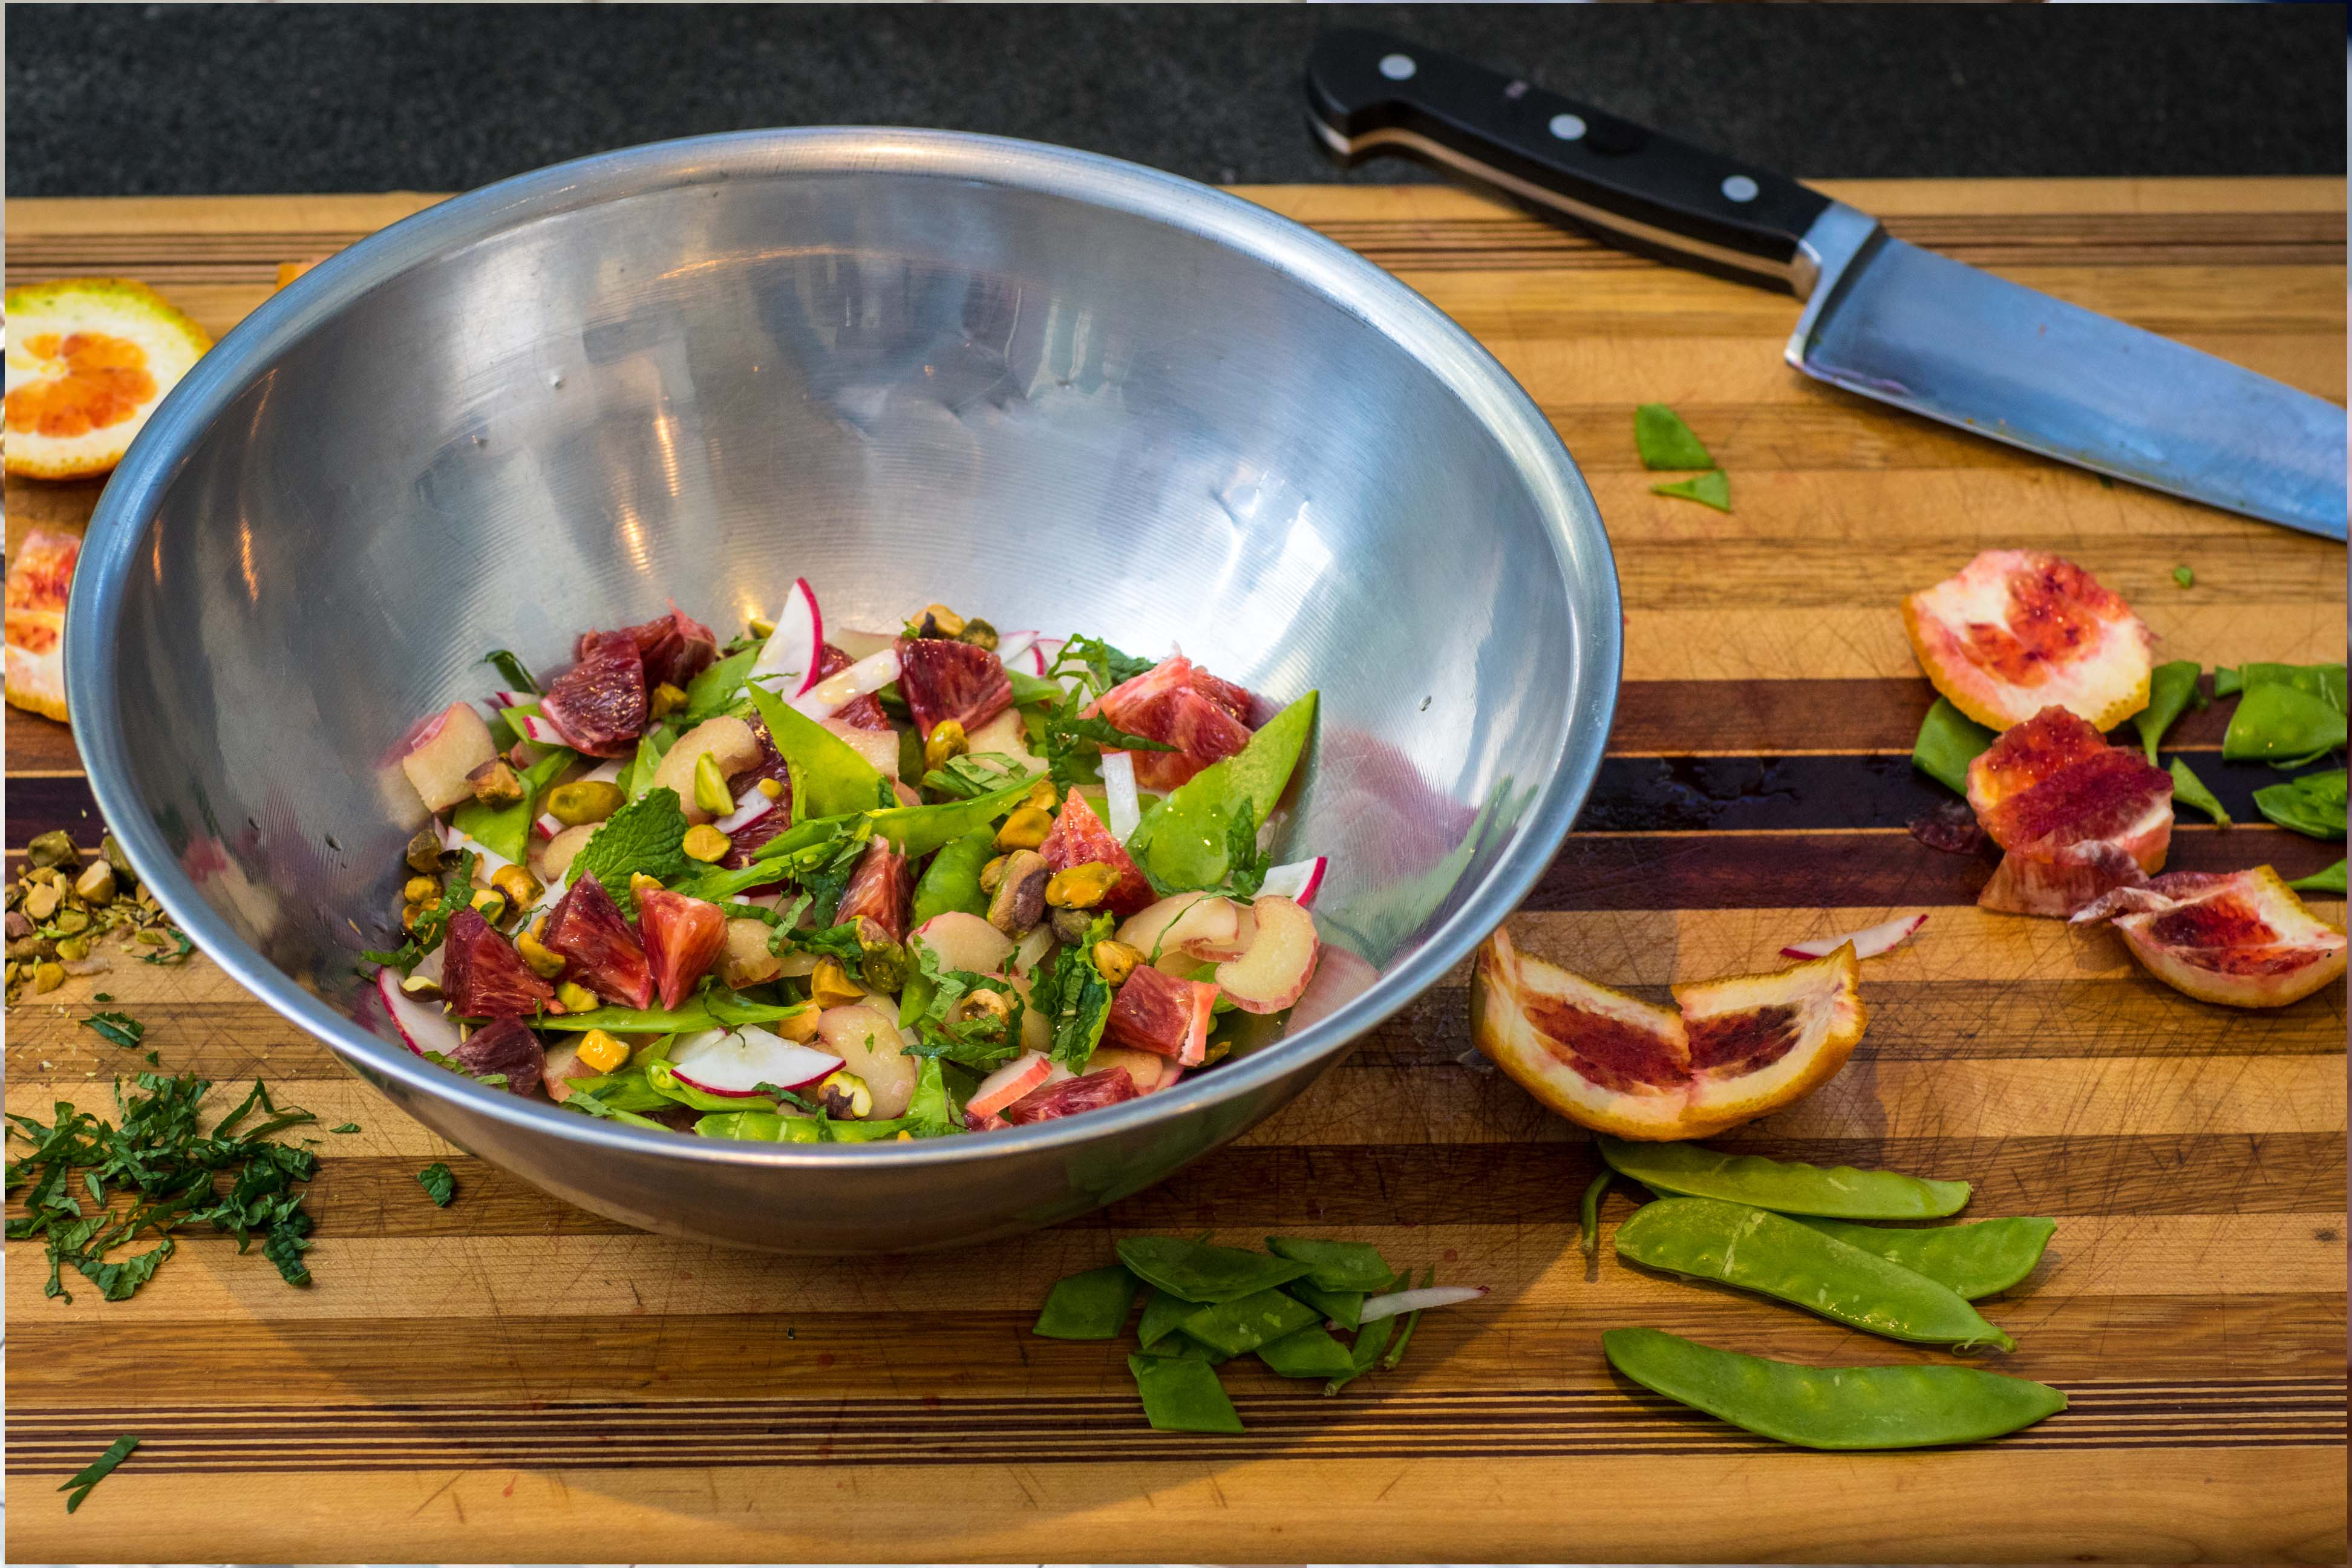 Rhurbarb Radish Pea Salad with Orange, Mint and Pistachio